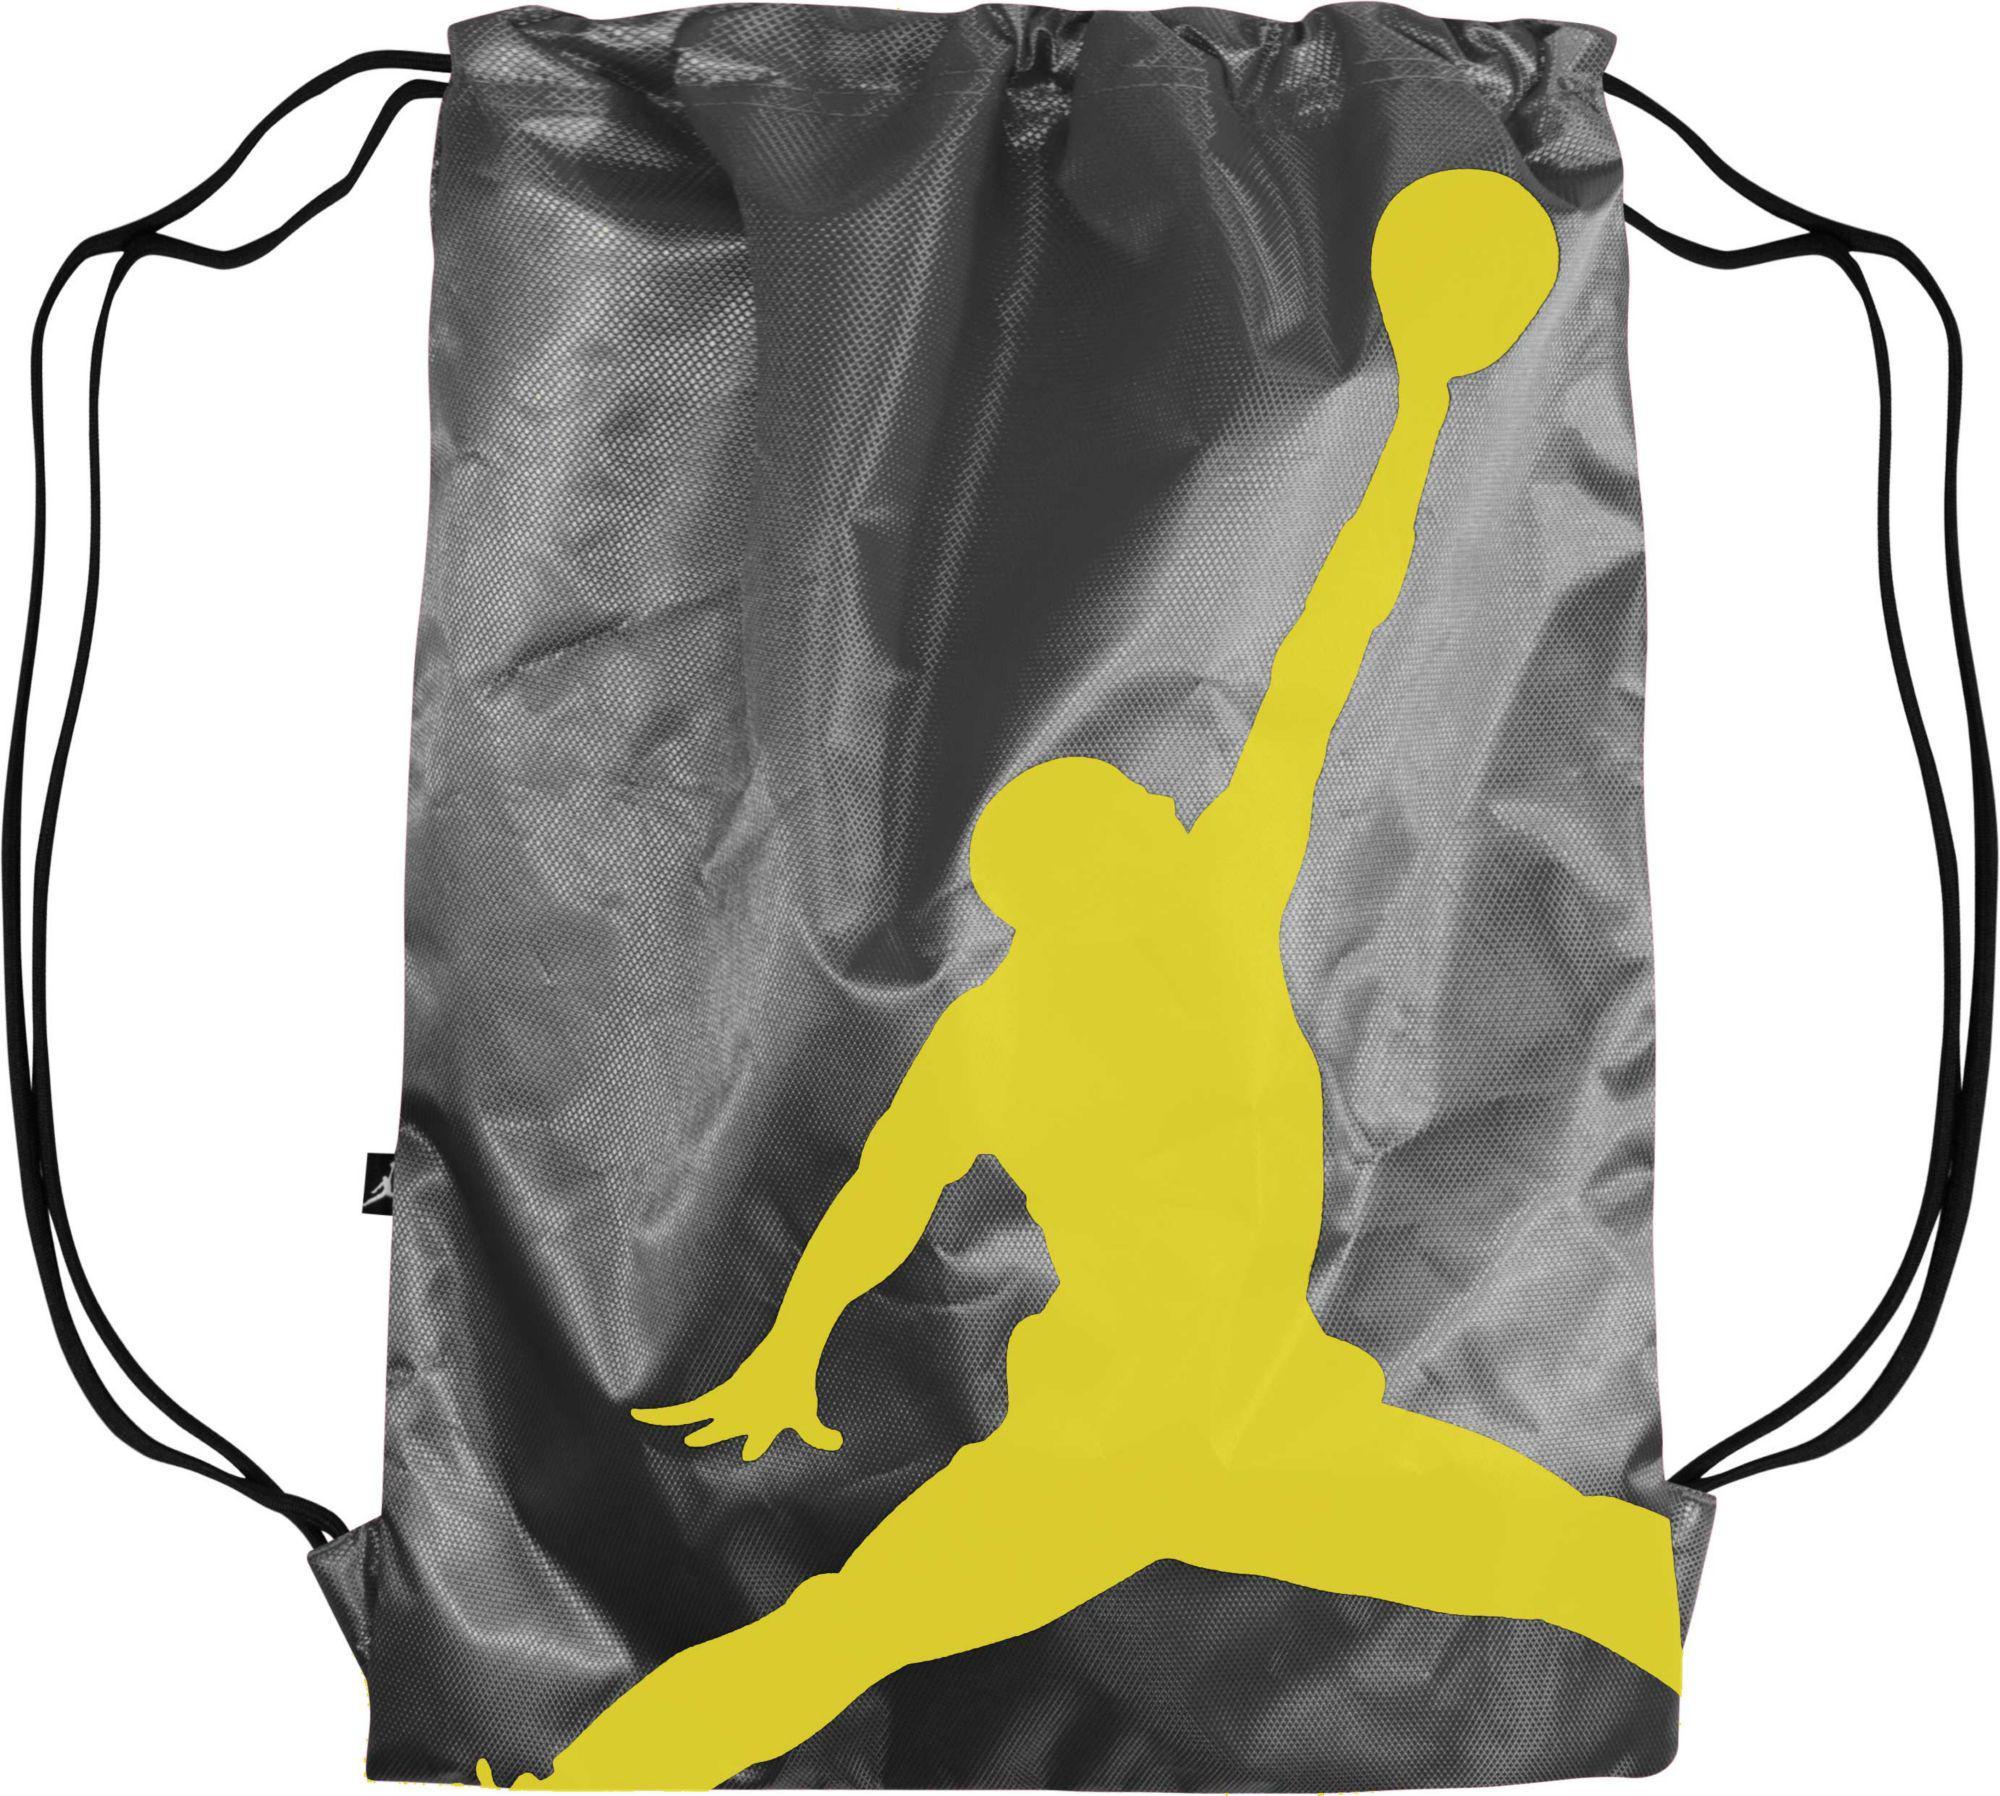 Lyst - Nike Iso Gym Sack in Black for Men b506ce9b9f80c